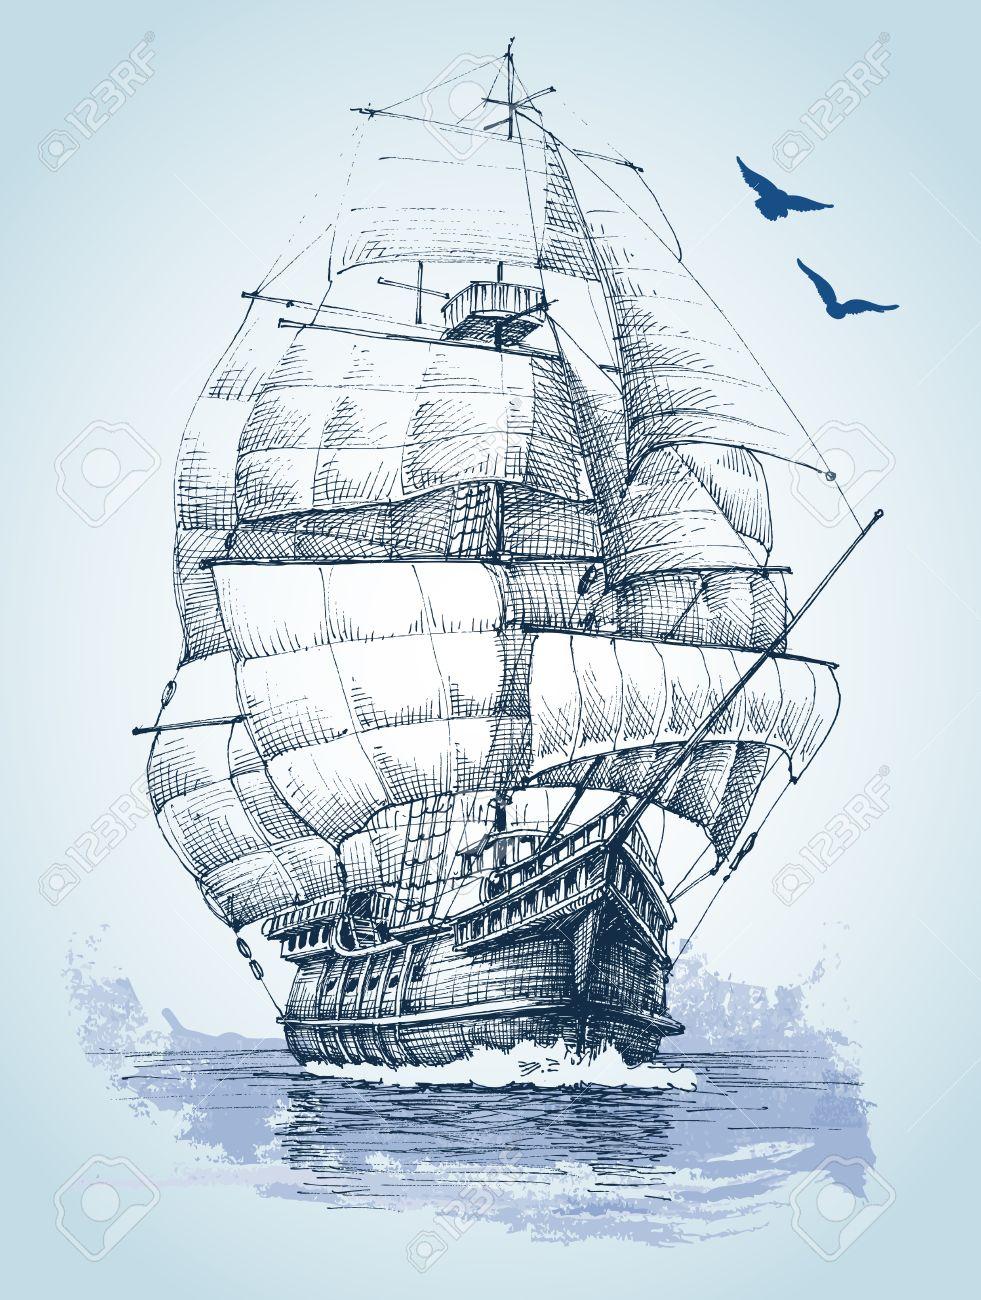 981x1300 Boat On Sea Drawing. Sailboat Vector Sketch Royalty Free Cliparts